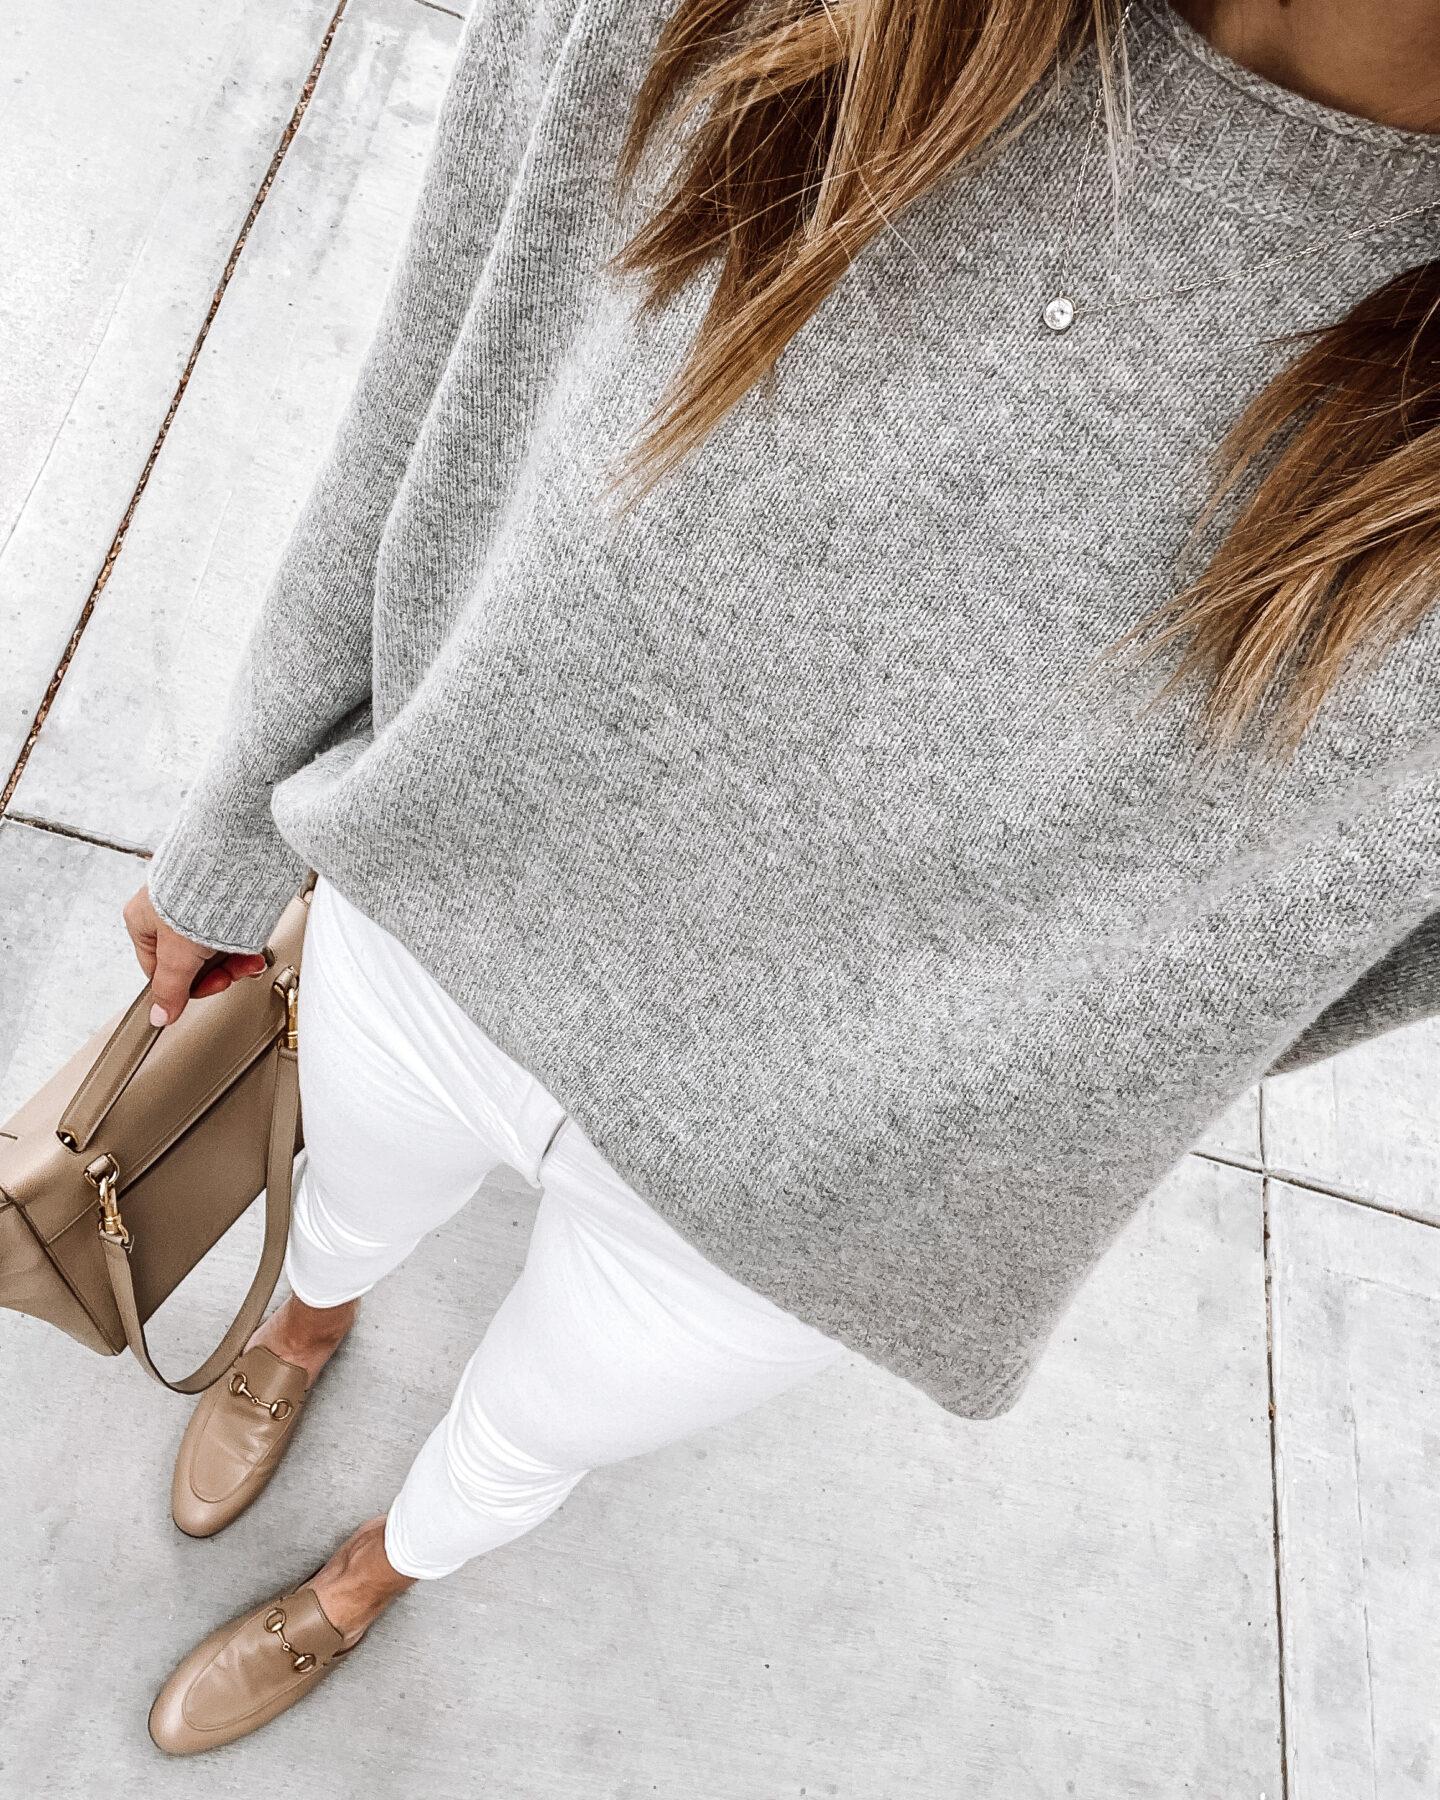 Fashion Jackson Wearing Jenni Kayne Everyday Sweater Grey White Skinny Jeans Gucci Mules Tan